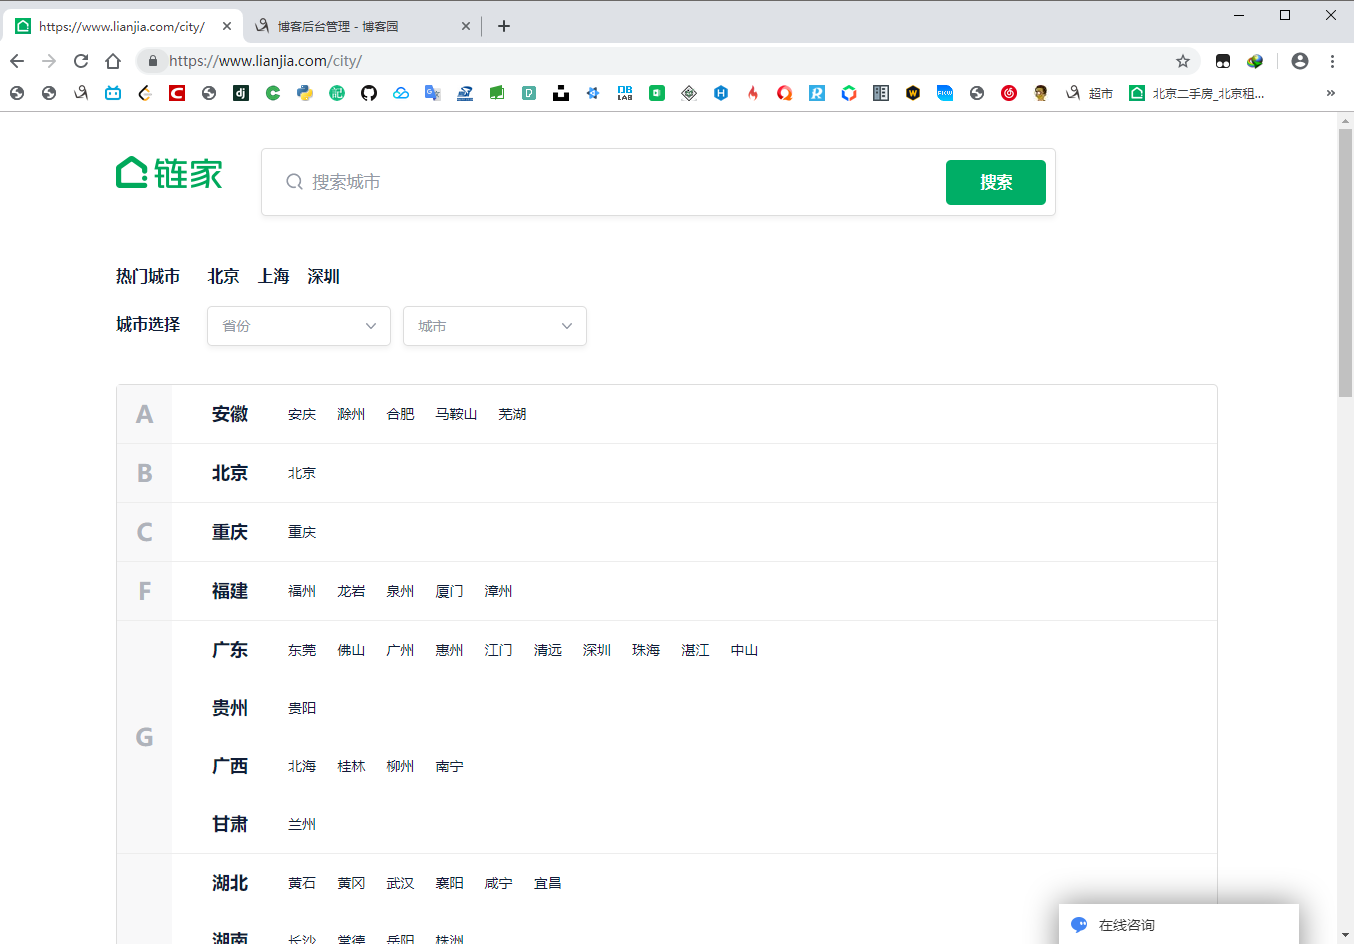 Python——Scrapy爬取链家网站所有房源信息- 可靠的企业级http代理/socks5